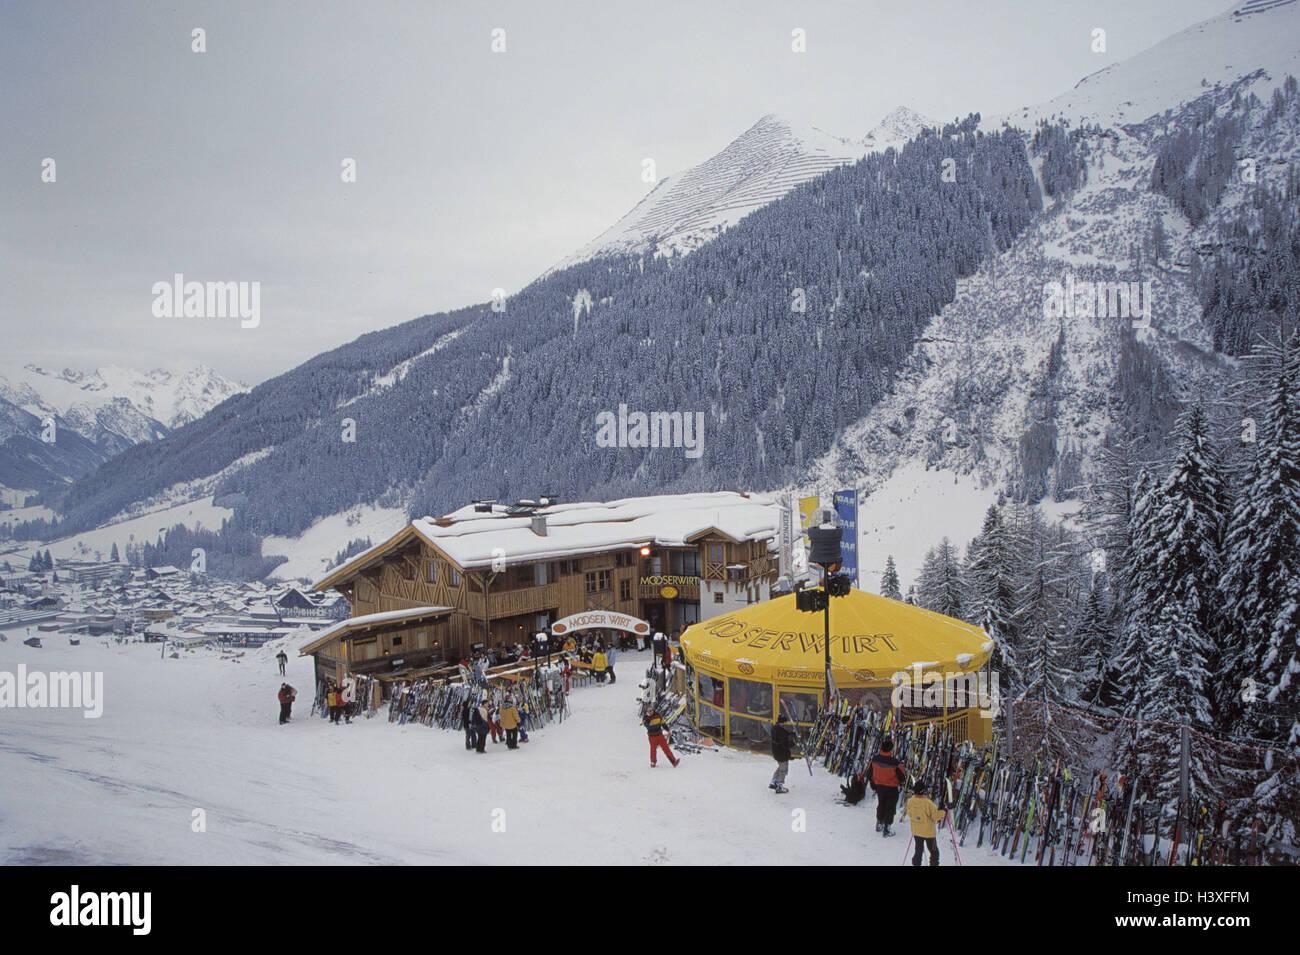 Austria, mountain Arl, St. Anton, ski hut, snow bar Mooserwirt, ski hut, Aprés ski, Apres ski, winter scenery, - Stock Image